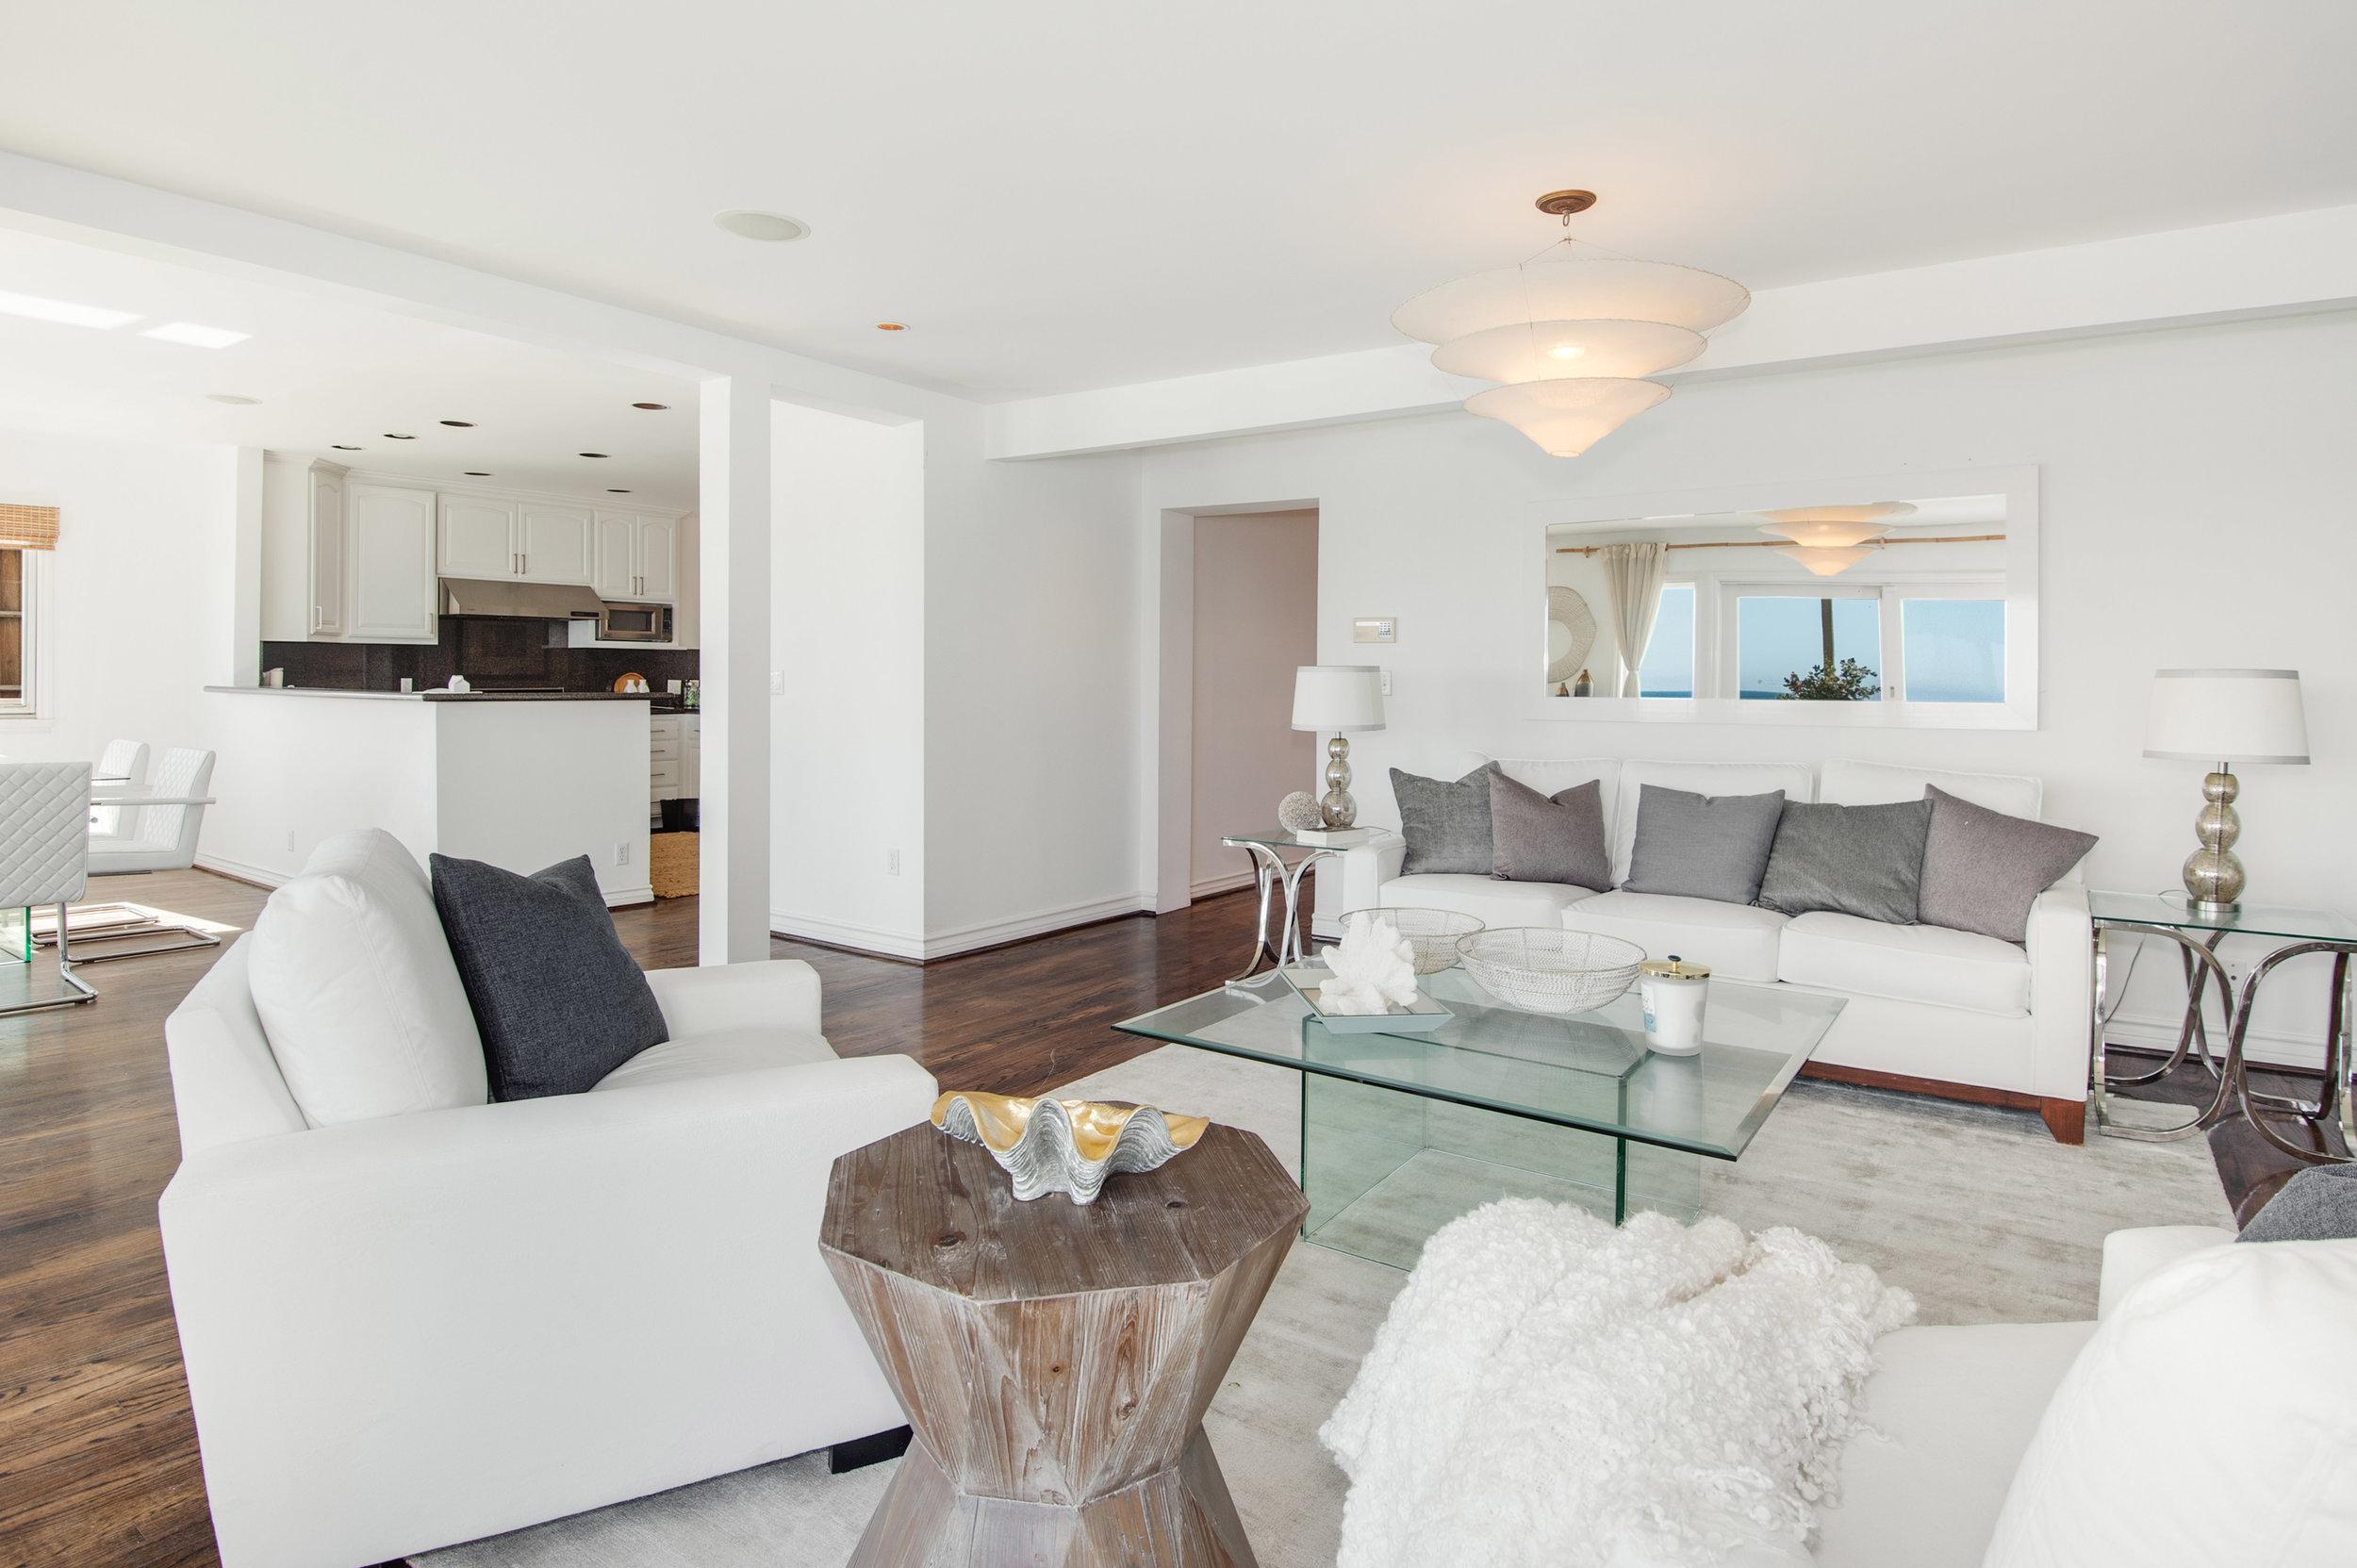 009 Living Room 25342 Malibu Road For Sale Lease The Malibu Life Team Luxury Real Estate.jpg